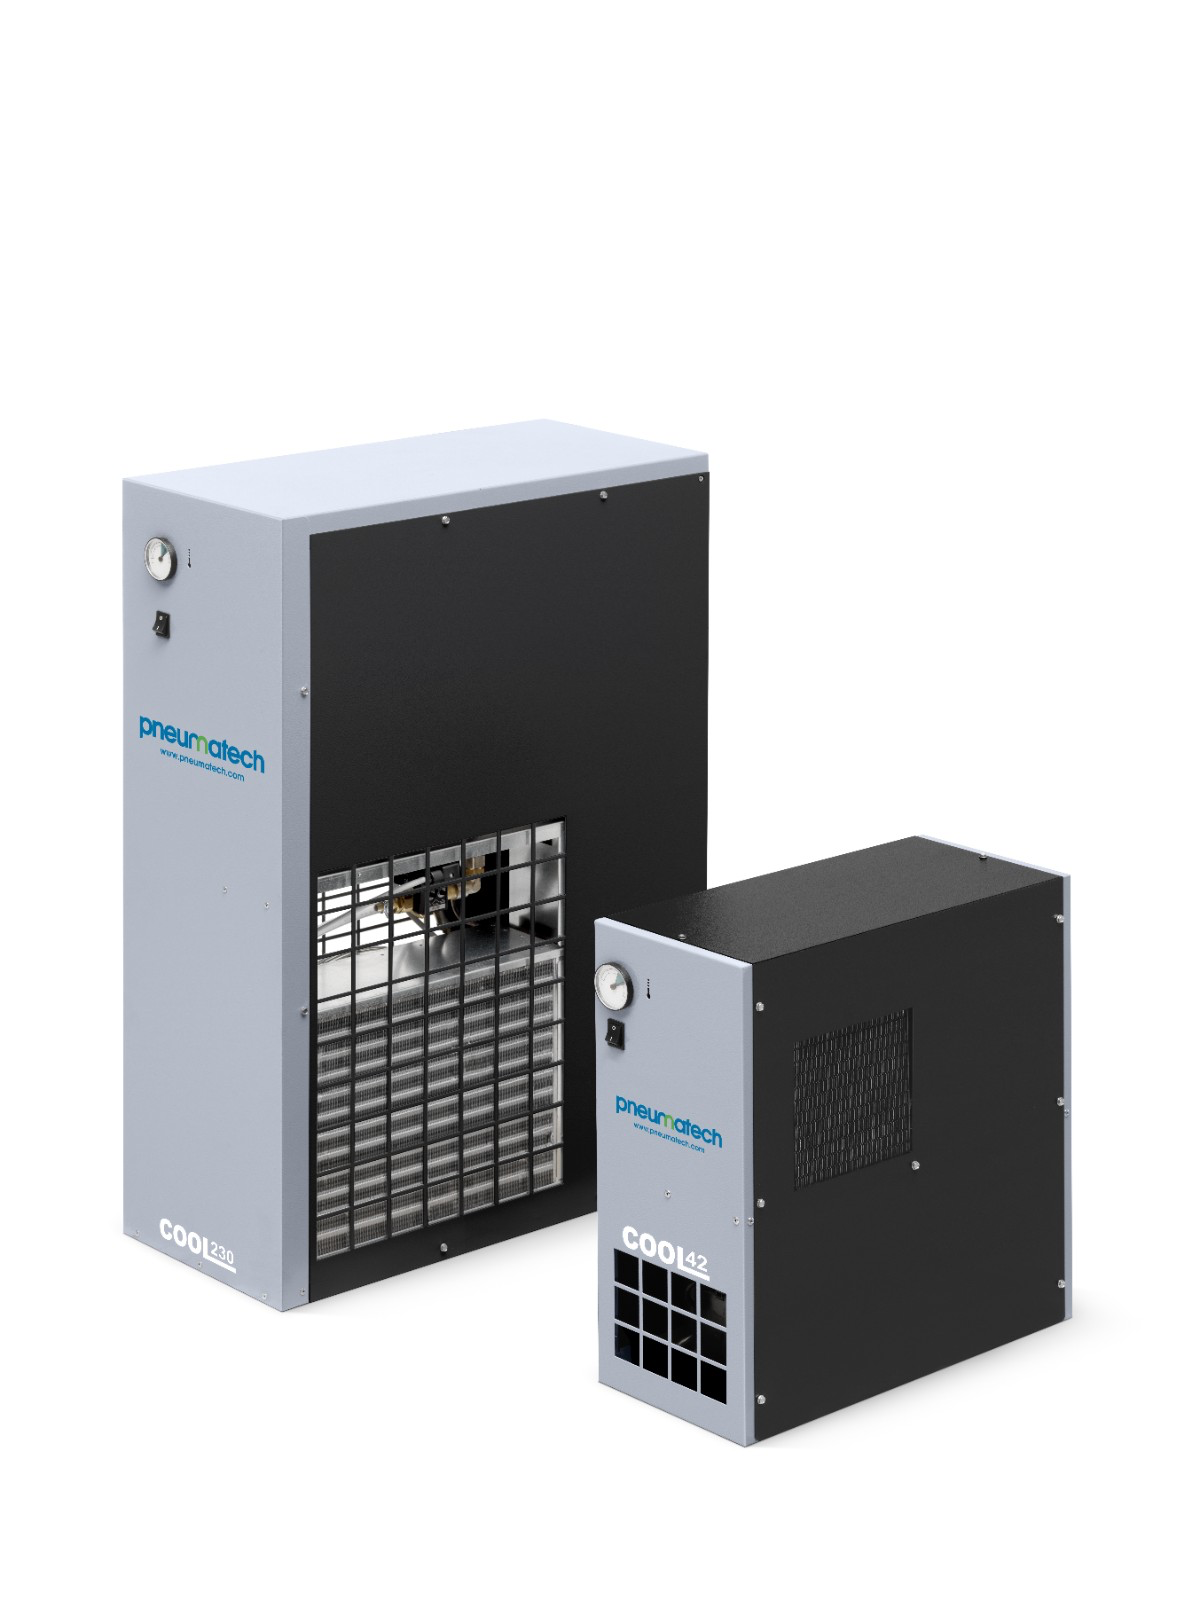 Pneumatech COOL Series – Non-Cycling Dryers